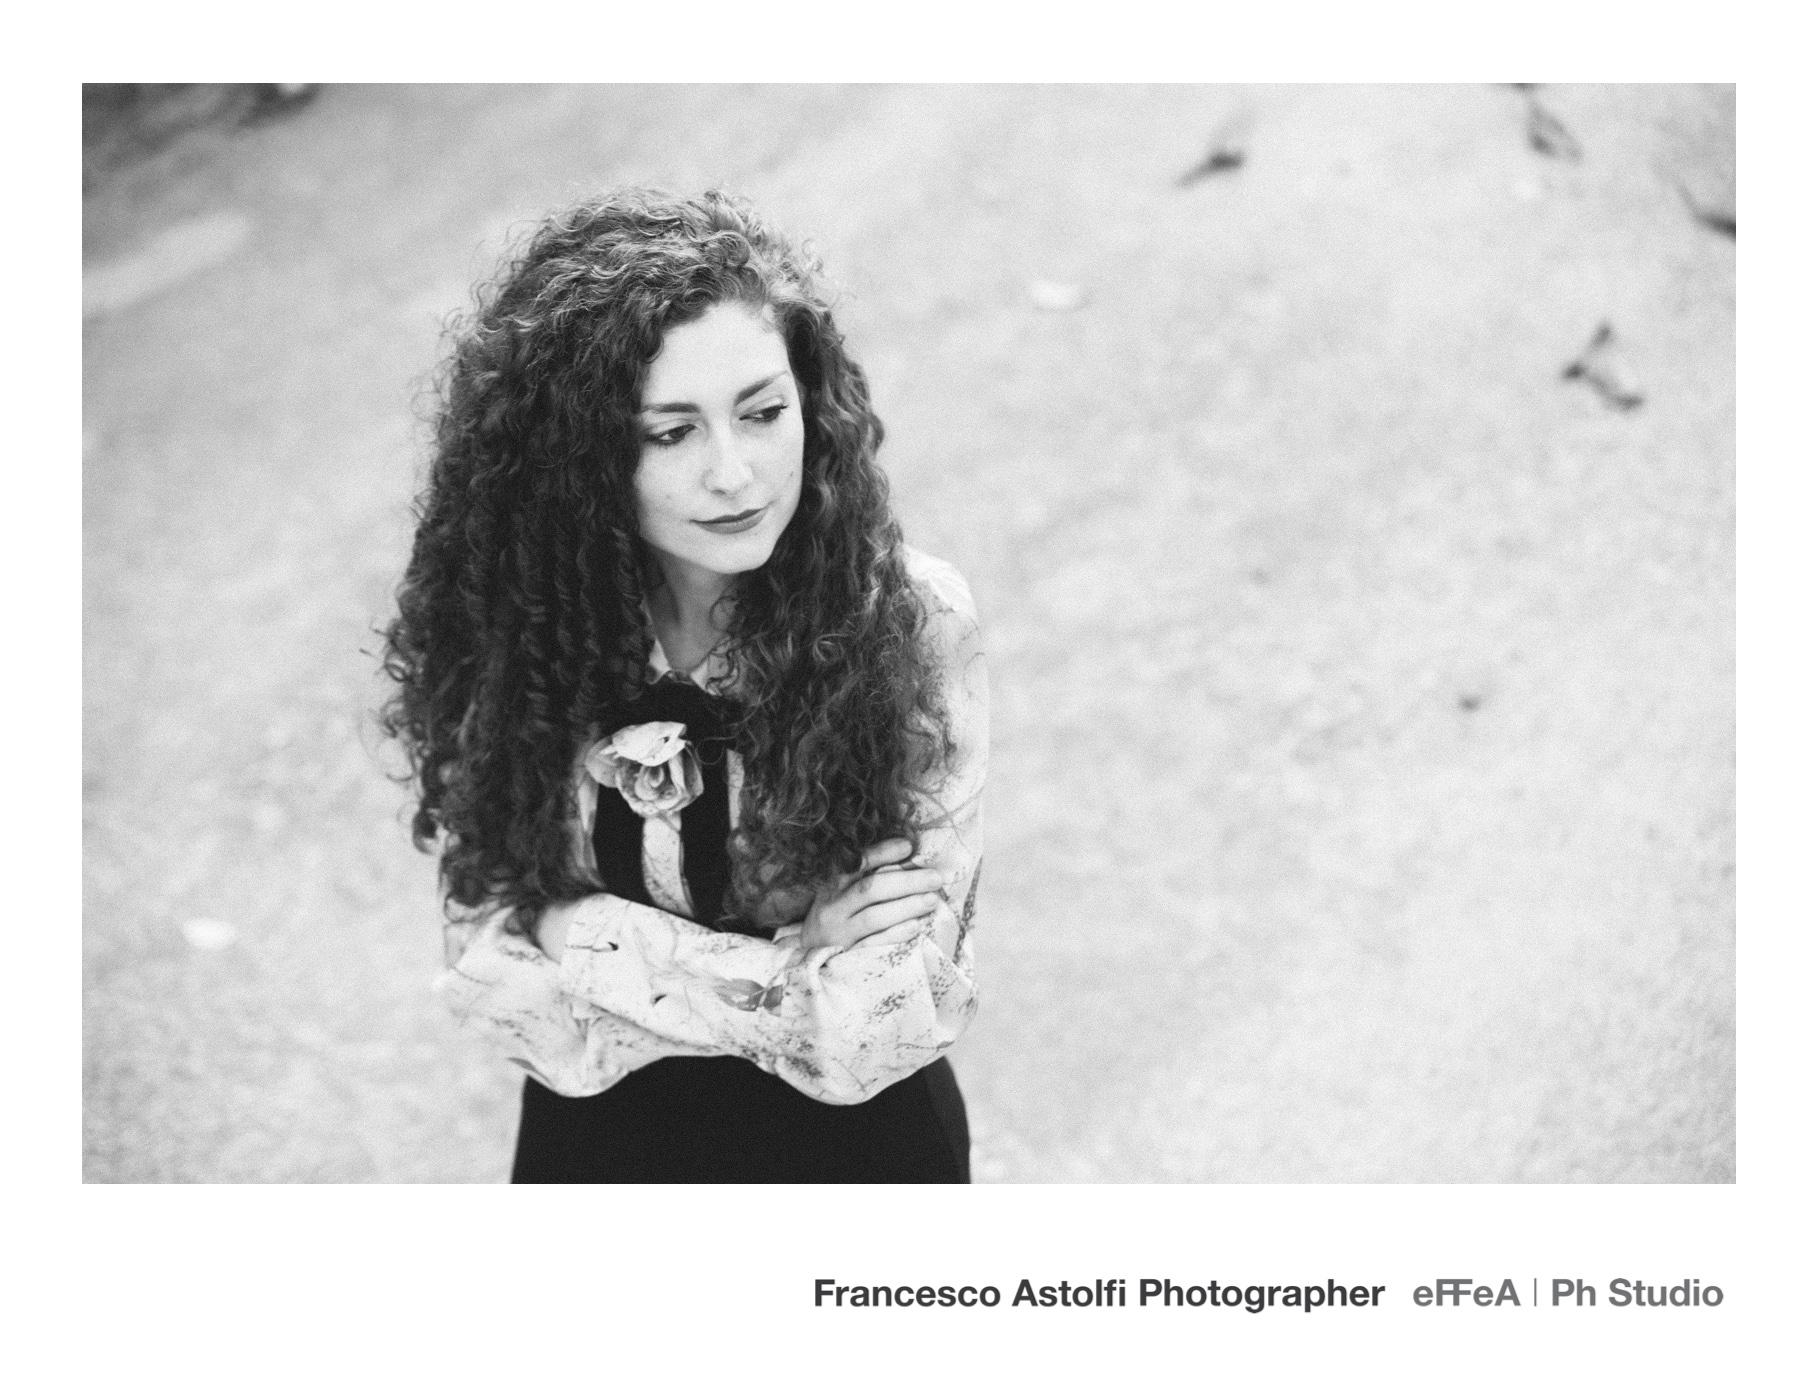 005 - Gentile Catone - Photo by Francesco Astolfi